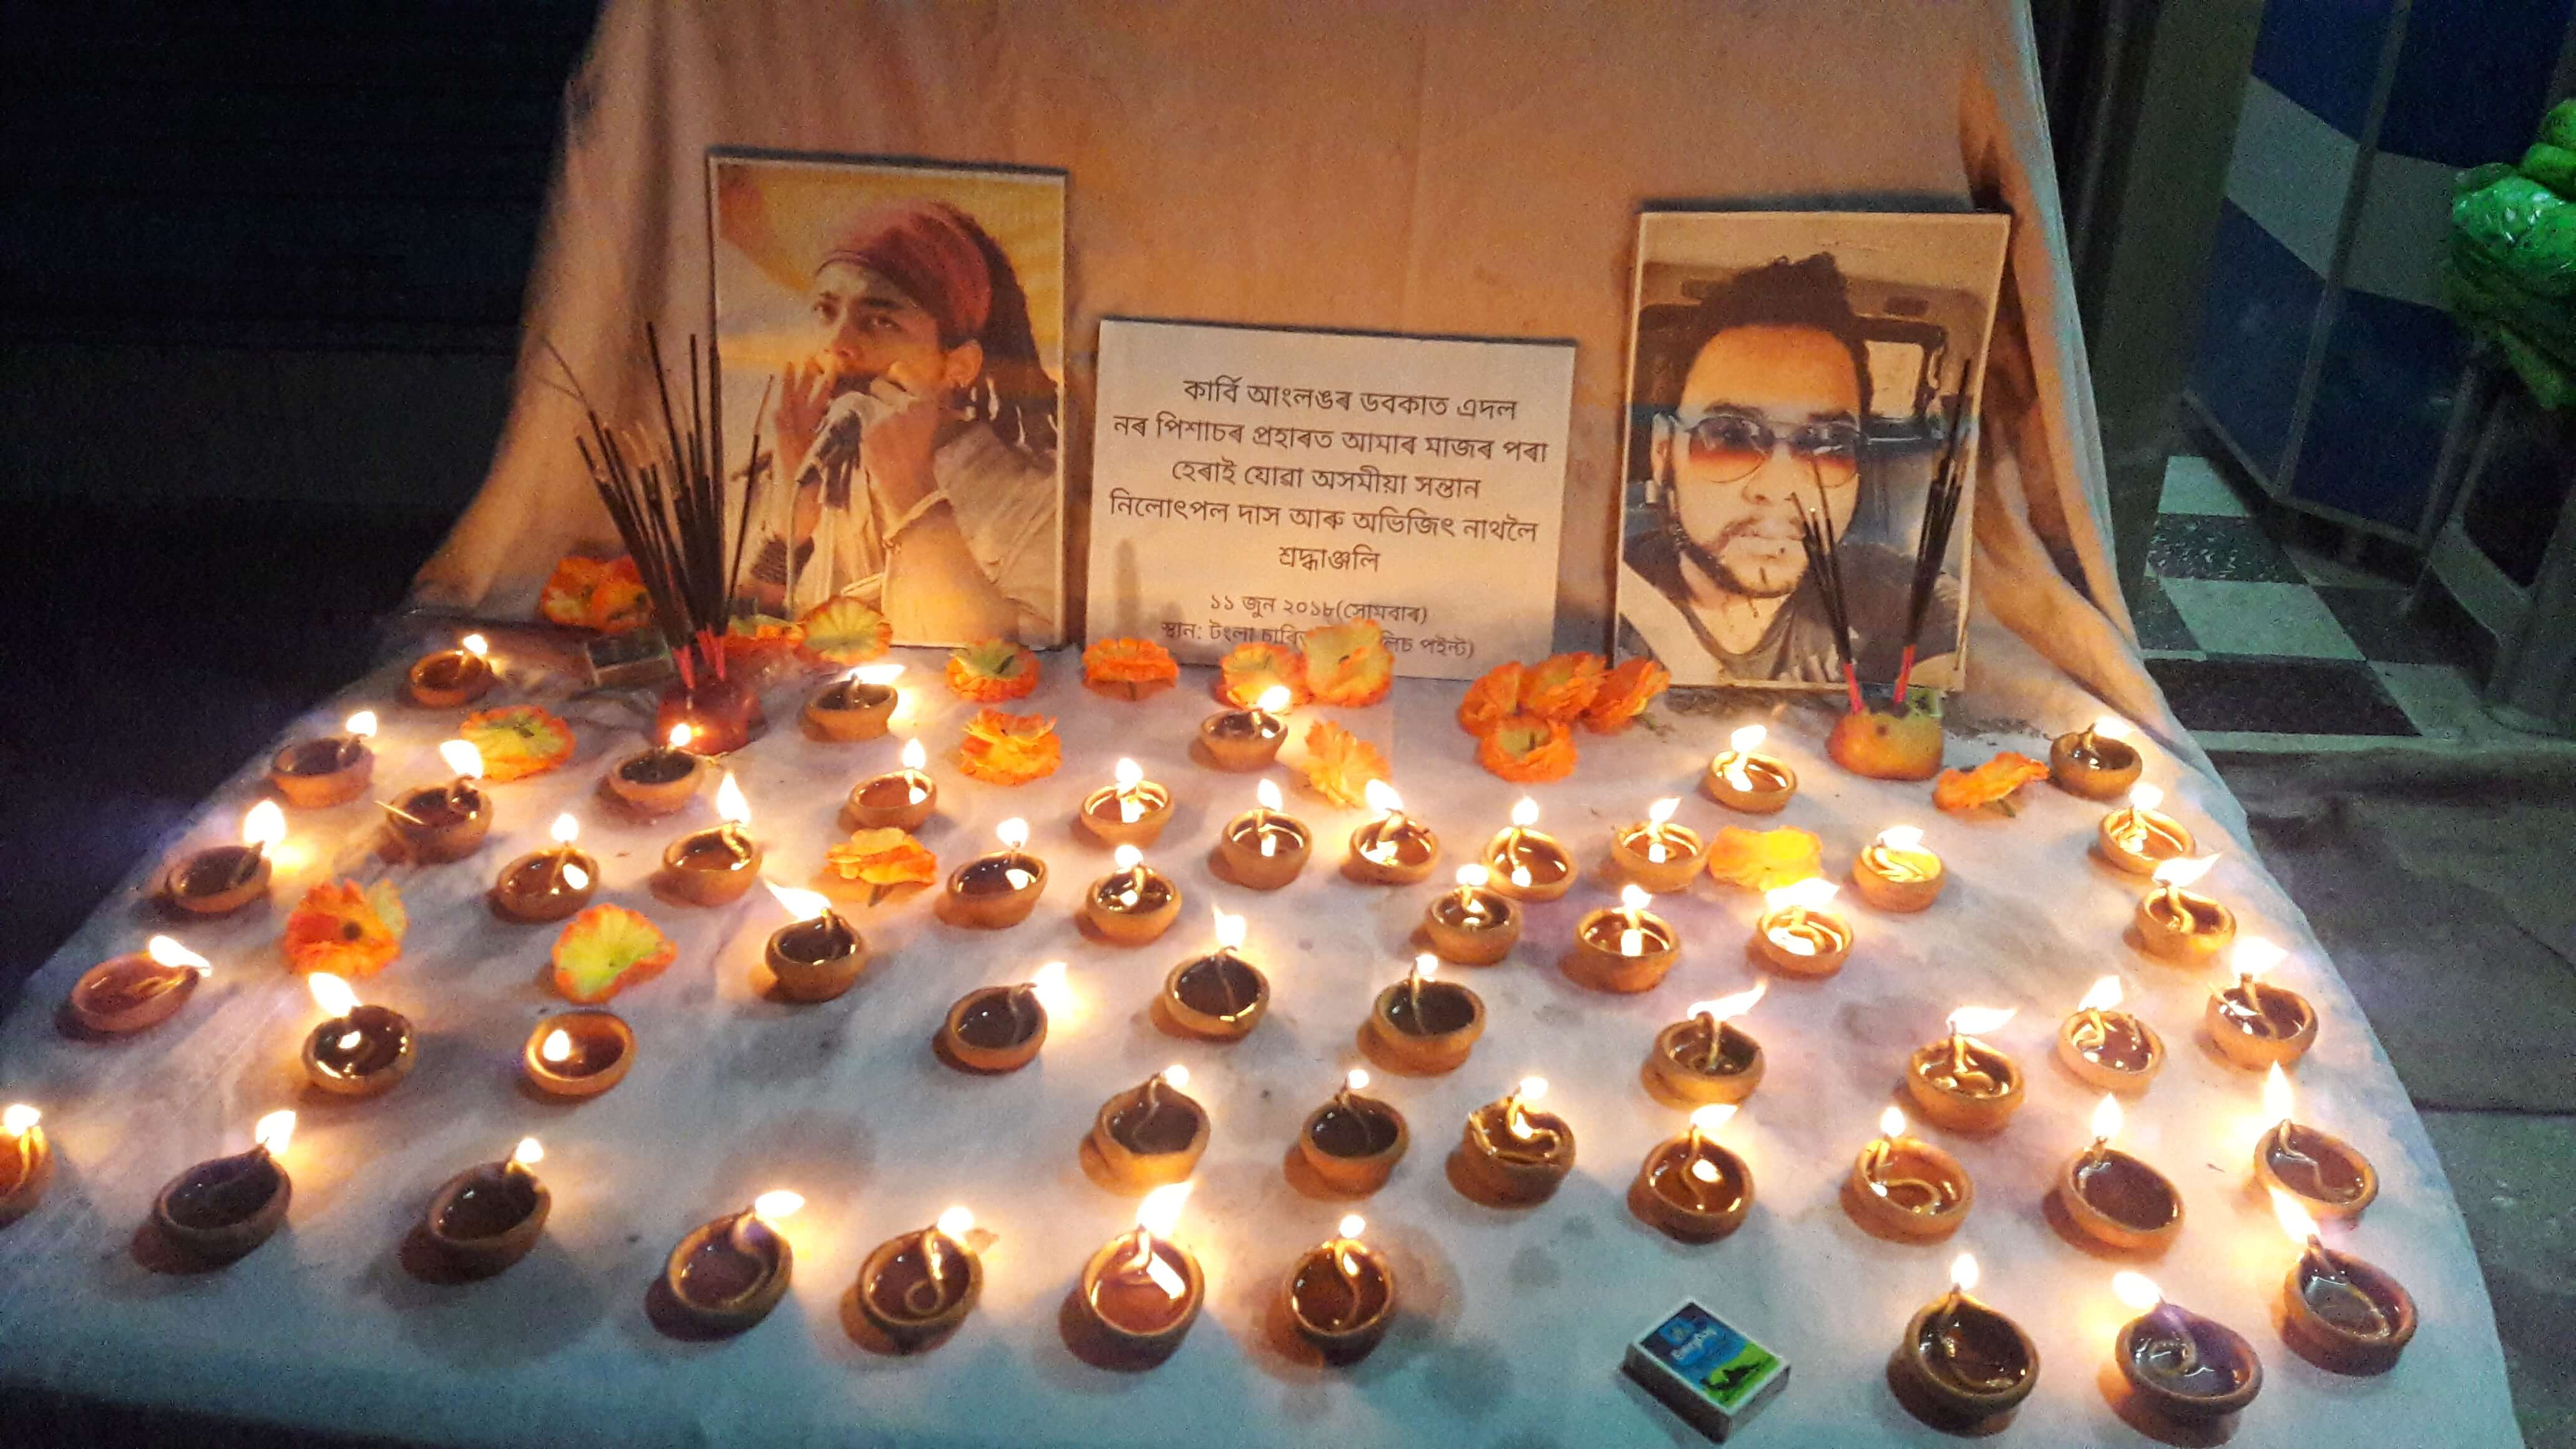 Candlelight protest against Dokmoka incident